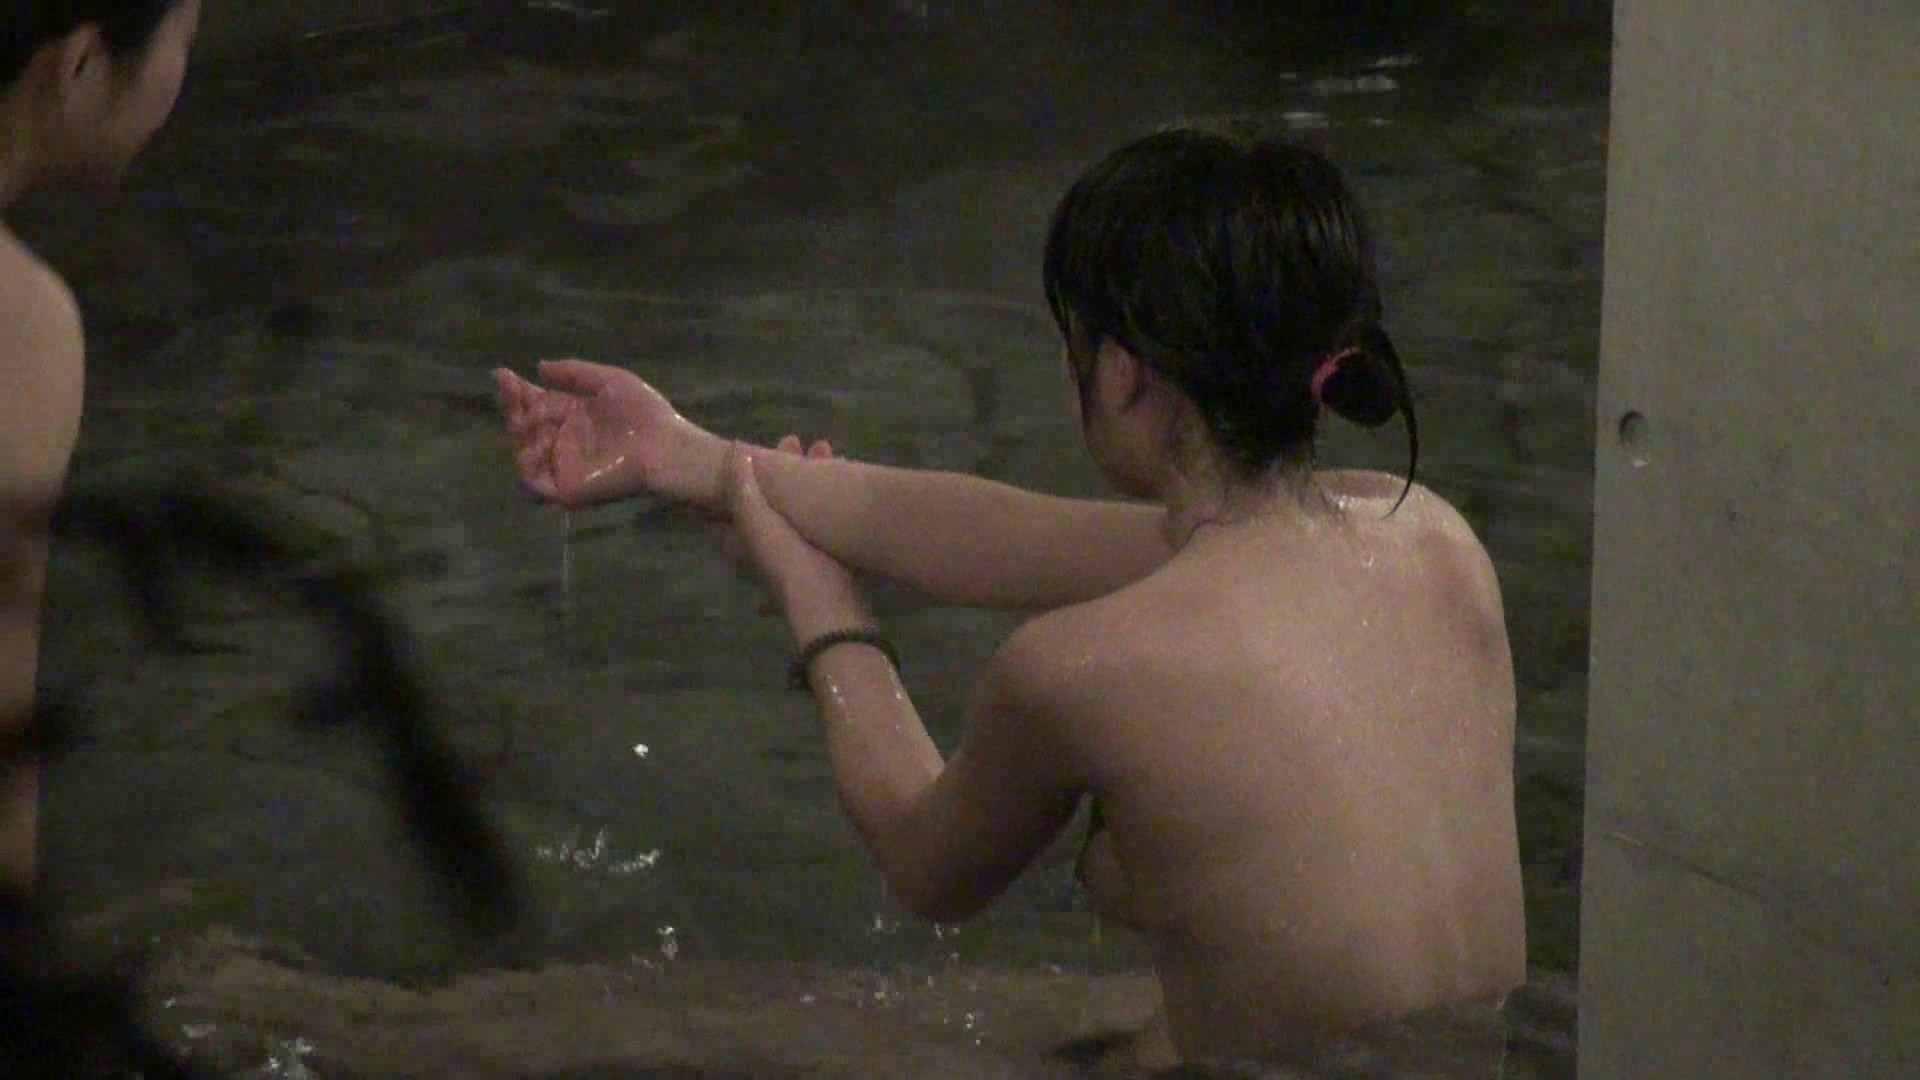 Aquaな露天風呂Vol.343 女体盗撮 盗撮ヌード画像 91連発 8